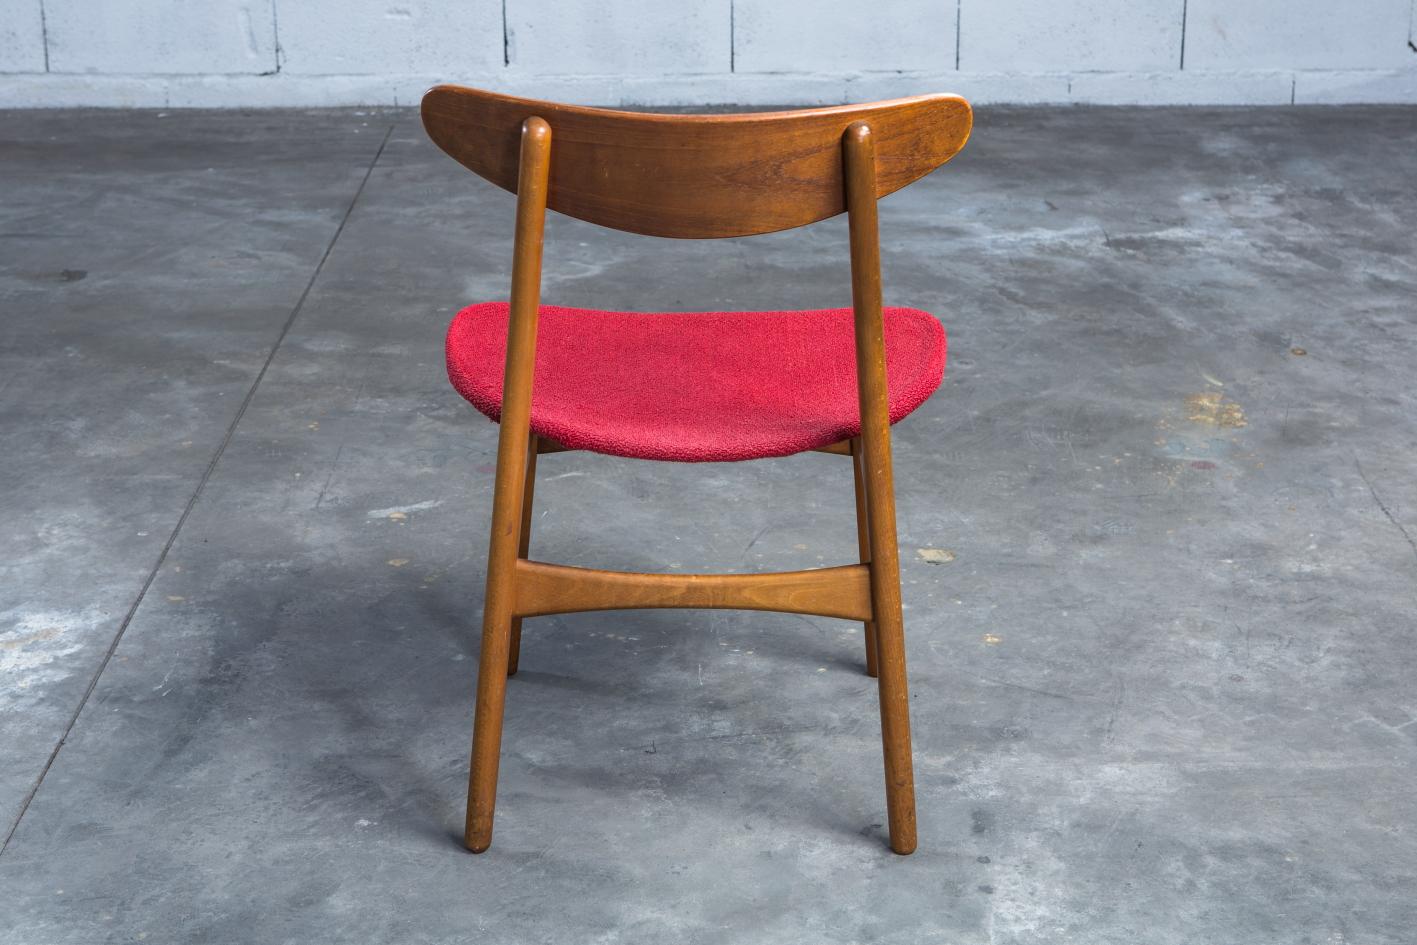 CH 30 chairs - Hans J. Wegner for Carl Hansen - Back view